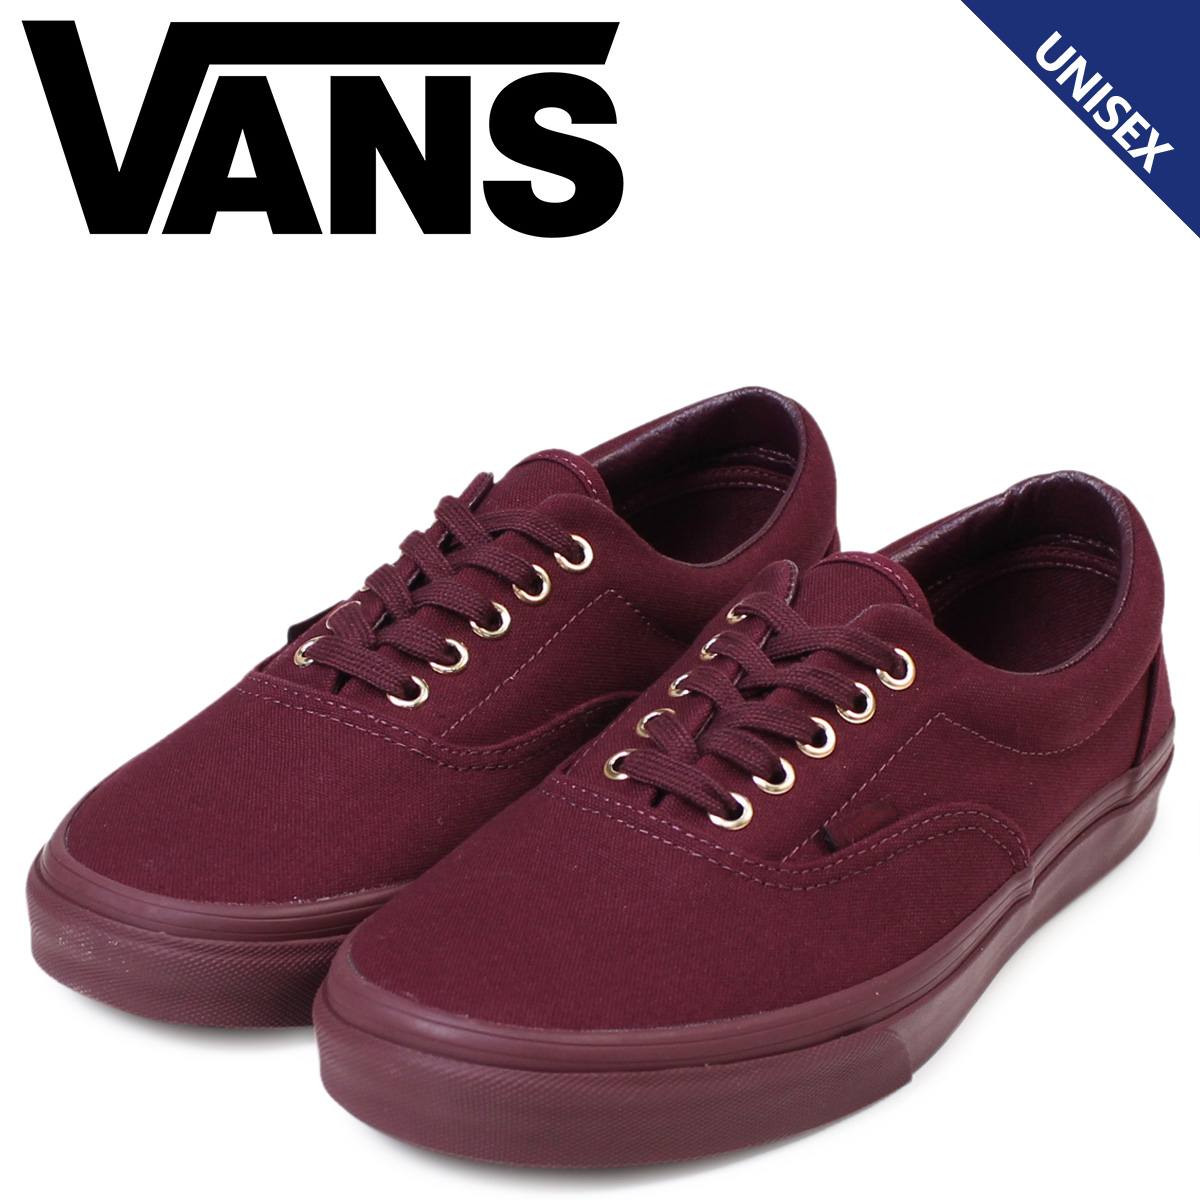 VANS ERA vans sneakers men gap Dis station wagons gills GOLD MONO  VN0003Z5JRR shoes red  1 25 Shinnyu load  2443c084815d